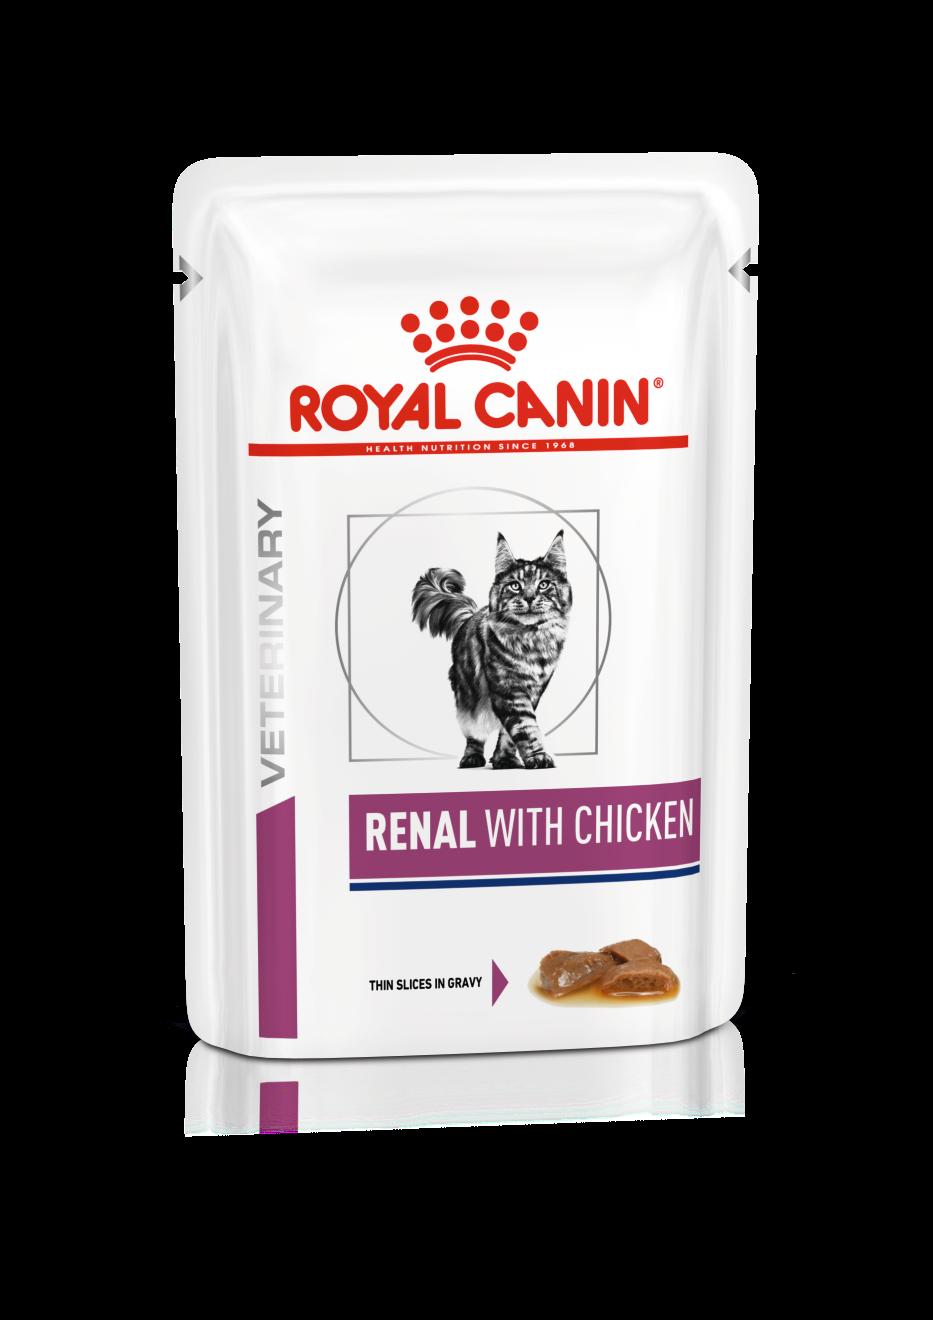 Renal с курицей (в соусе) product image